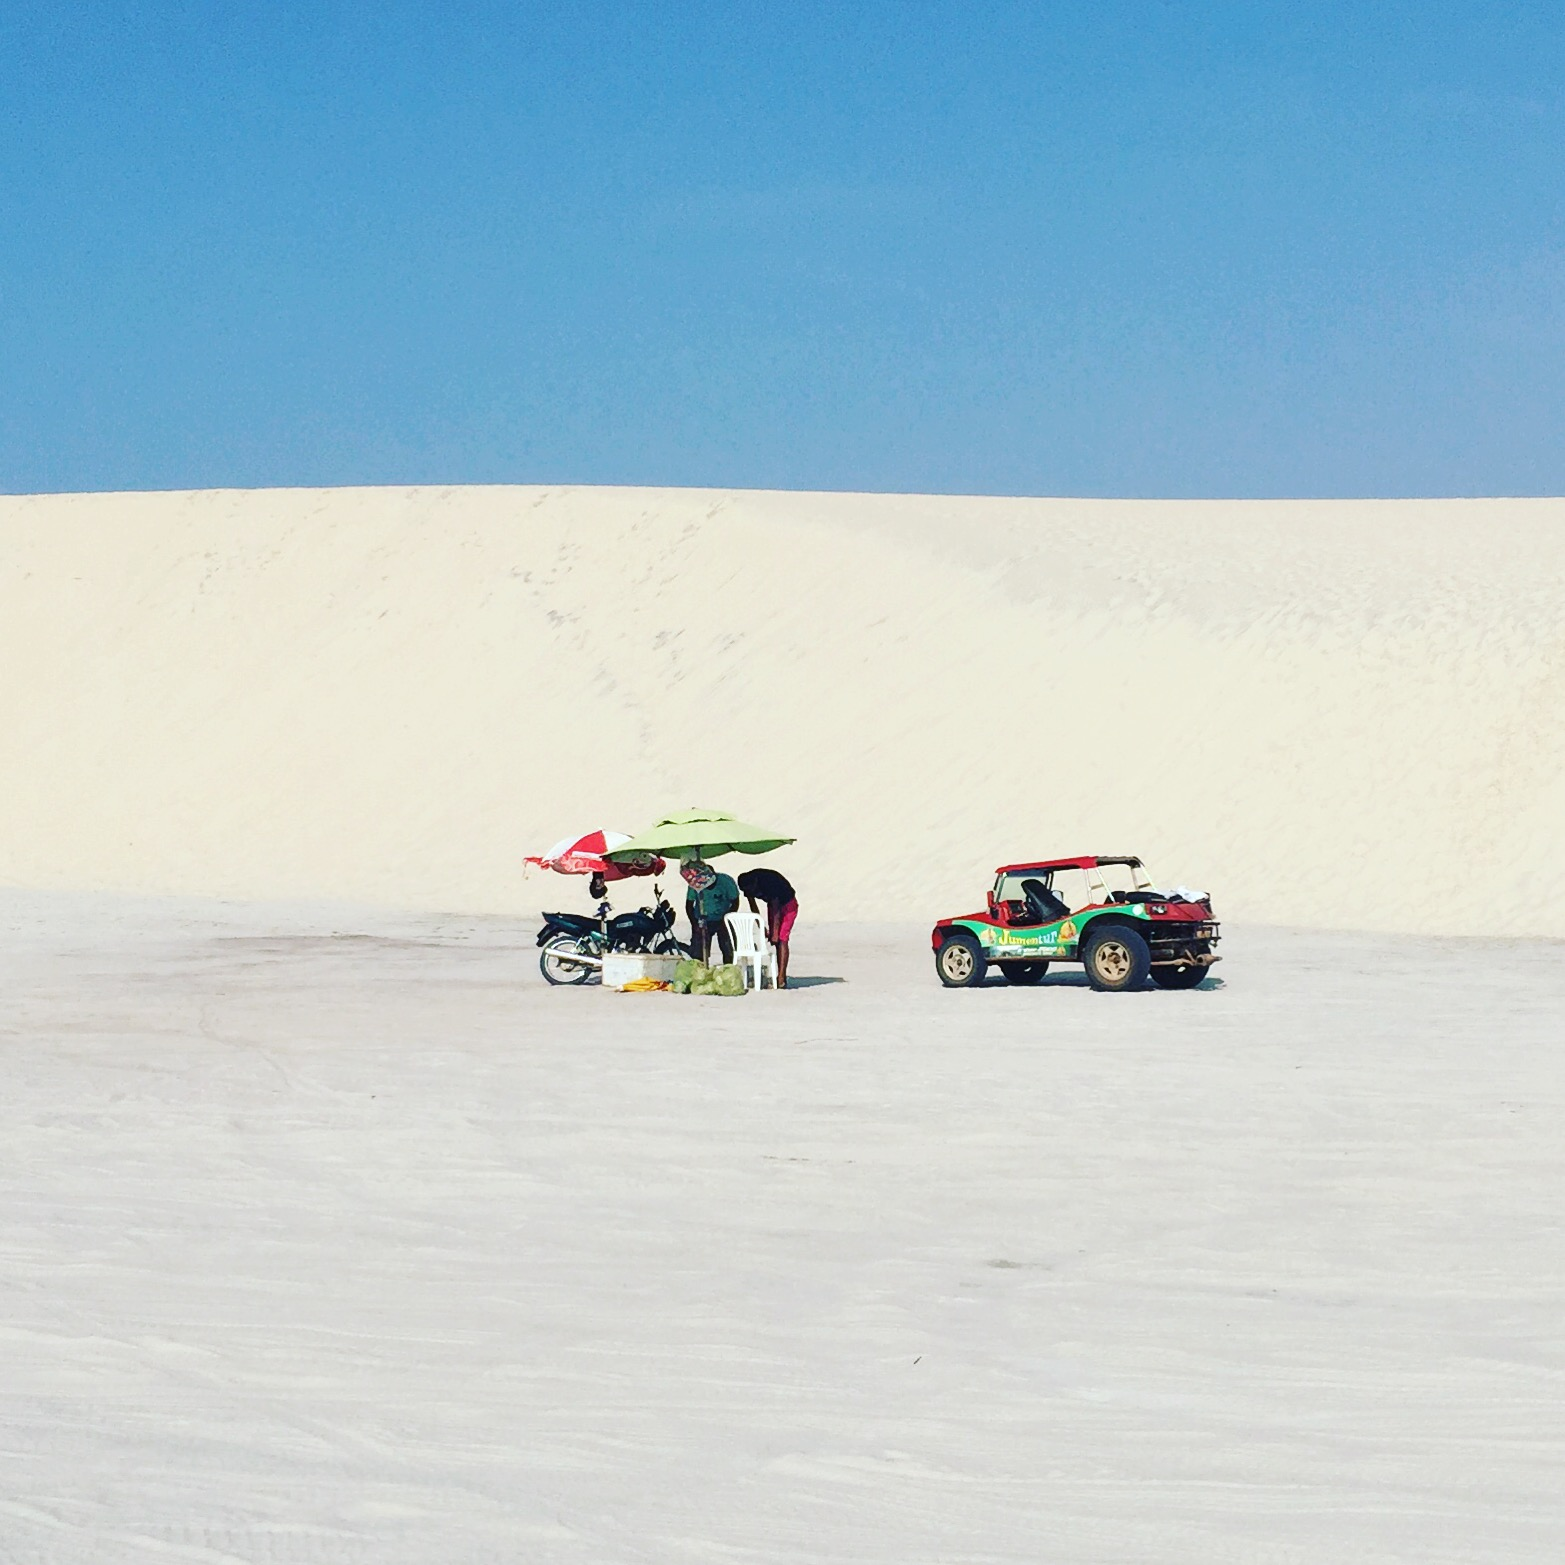 macchine-dune-relax-jericoacoara-spiagge - parco naturale